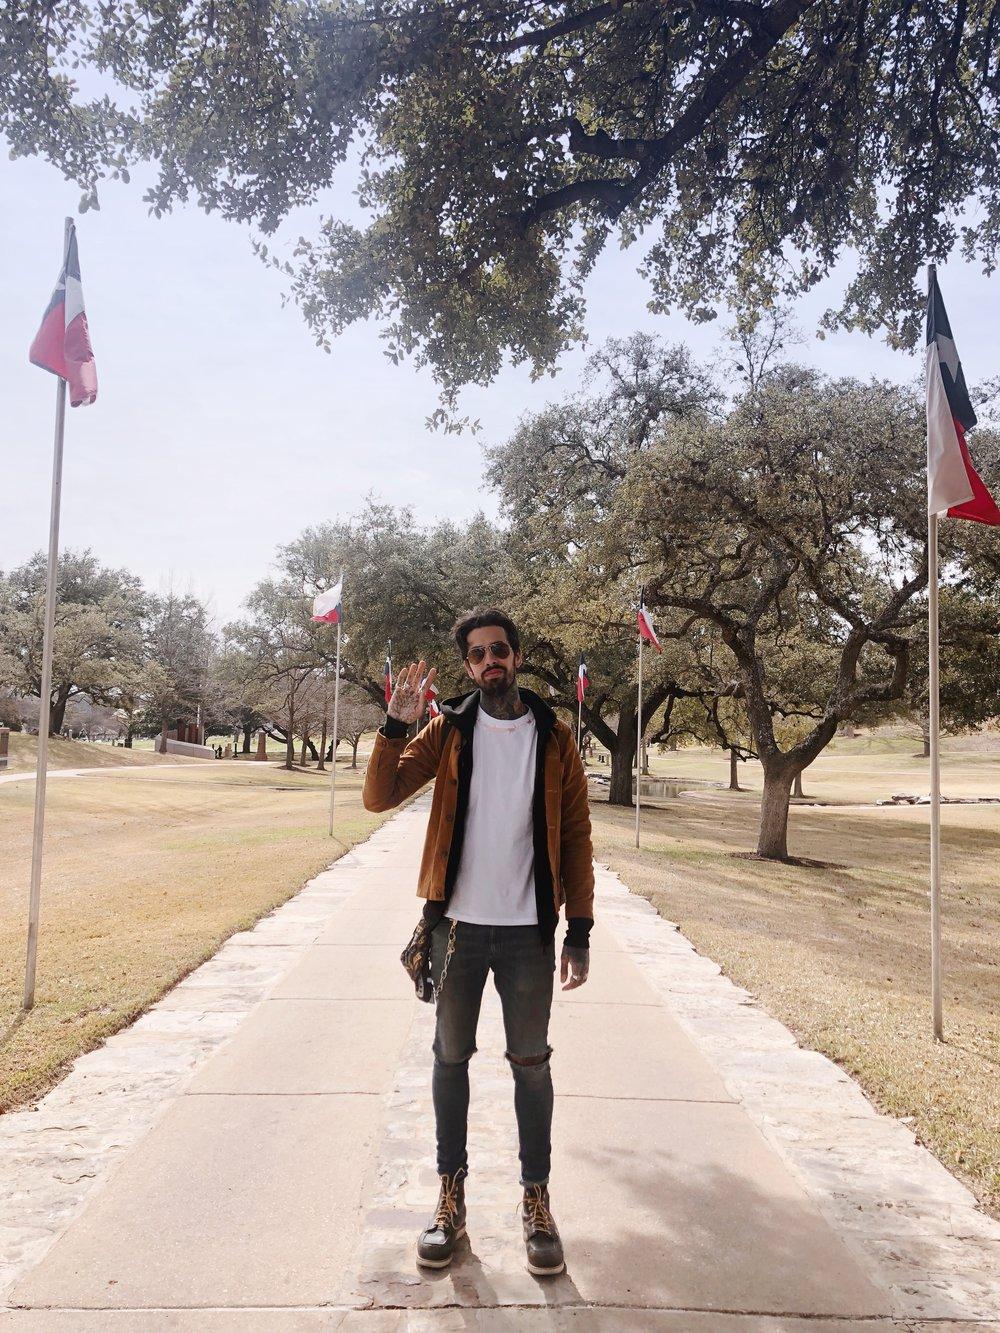 Austin Travel Guide - —————